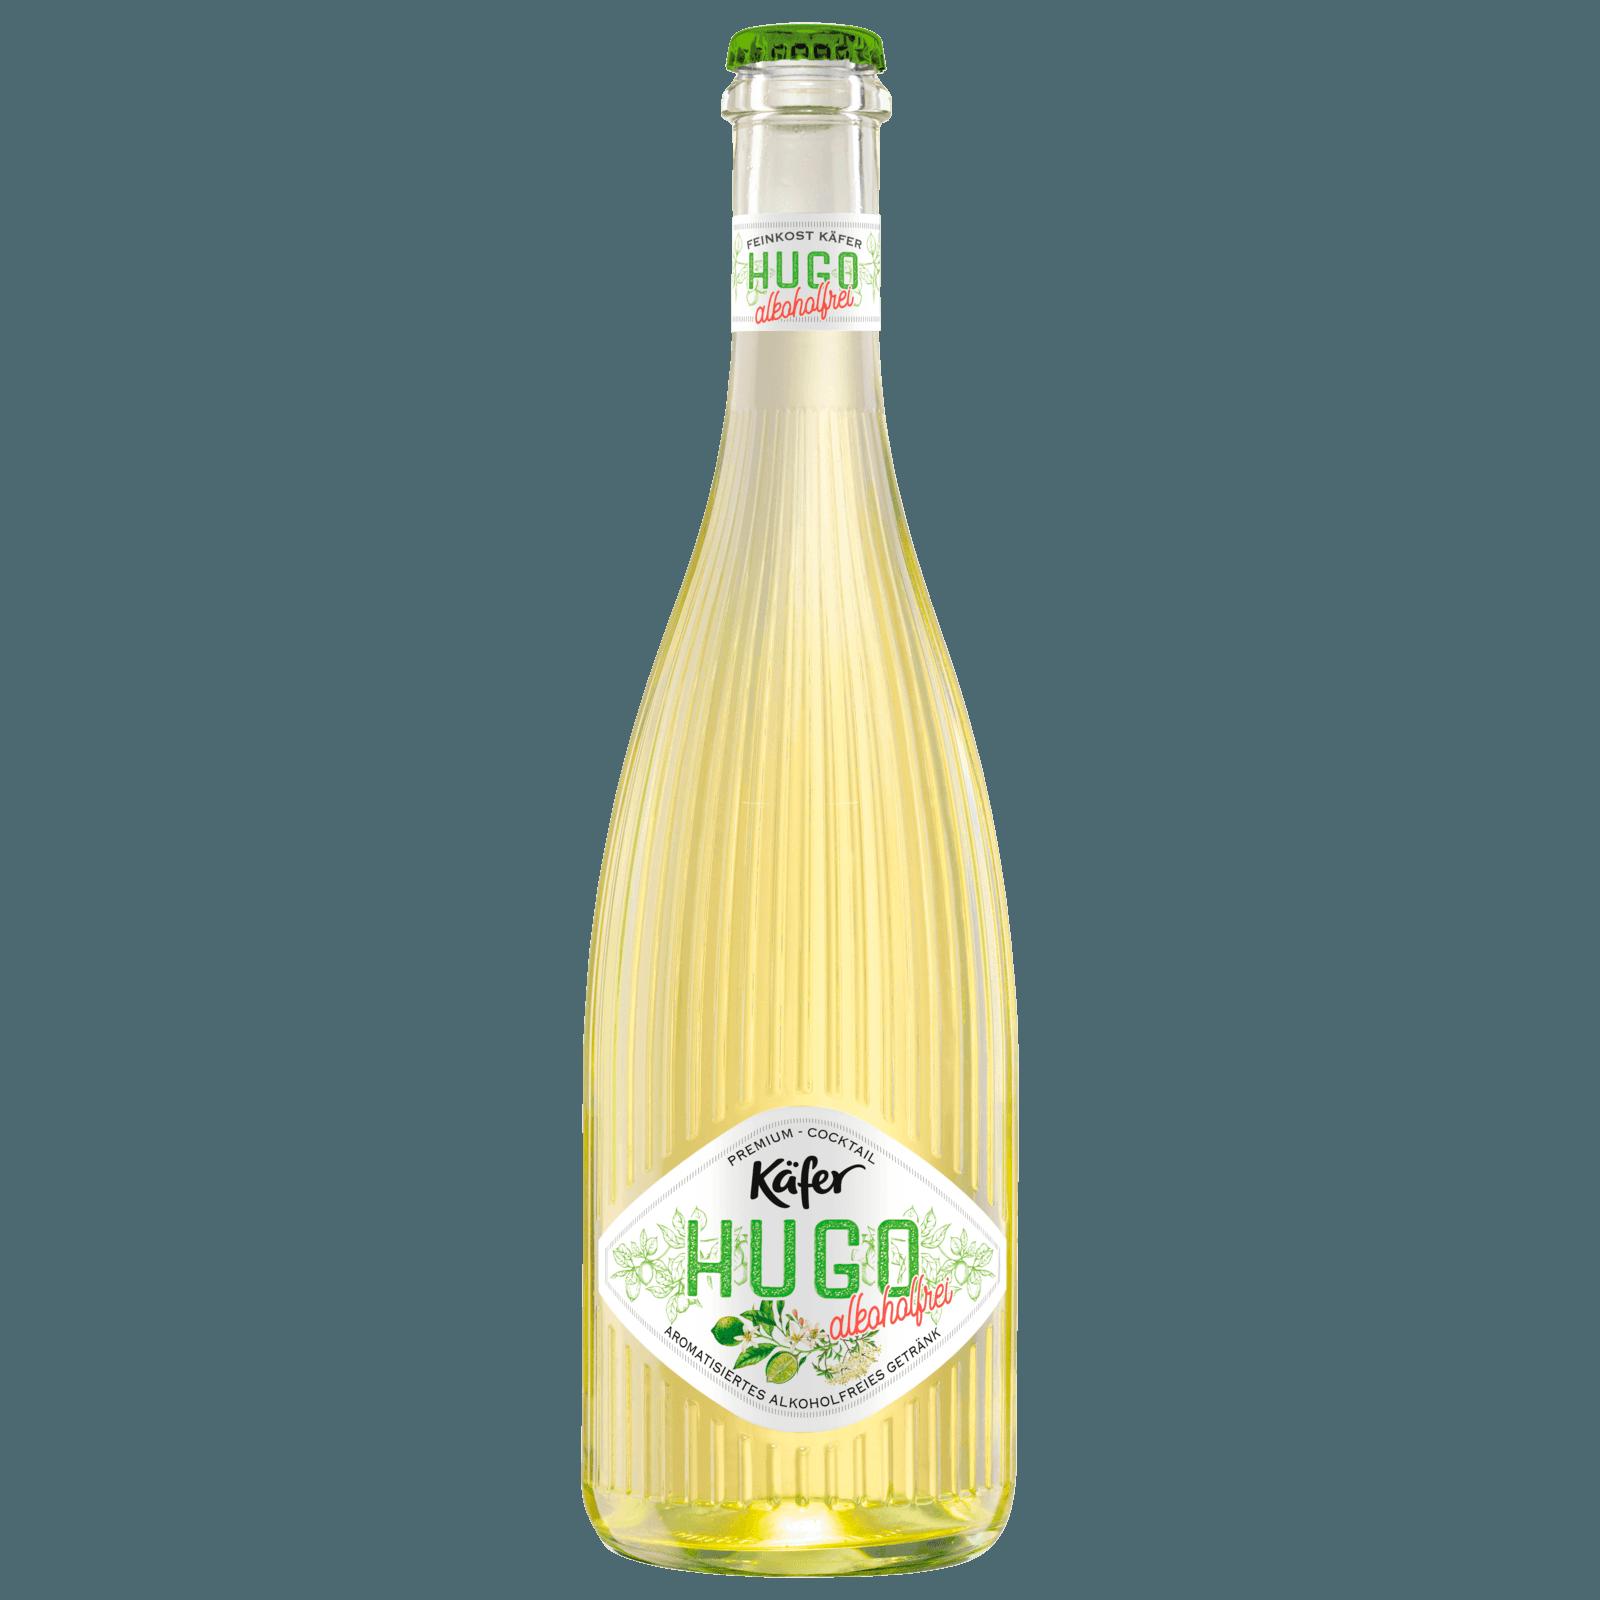 Käfer Hugo Alkoholfrei Holunderblüte + Limette 0,75l